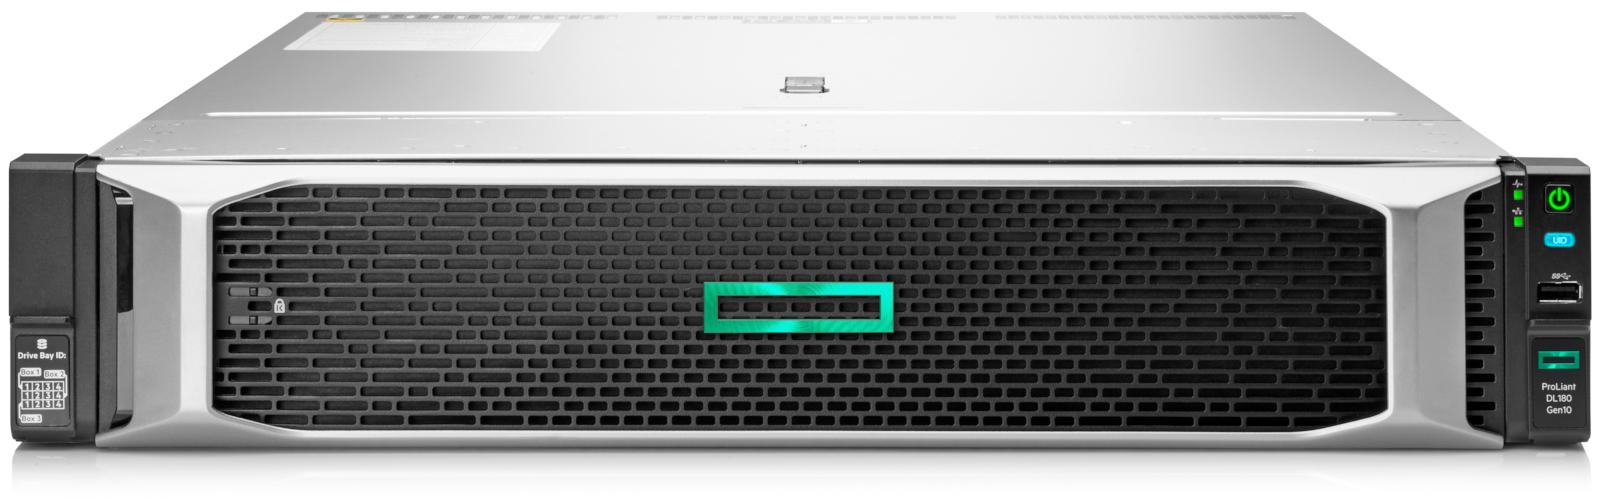 Hewlett Packard Enterprise ProLiant DL180 Gen10 server Intel Xeon Silver 2.1 GHz 16 GB DDR4-SDRAM 144 TB Rack (2U) 500 W